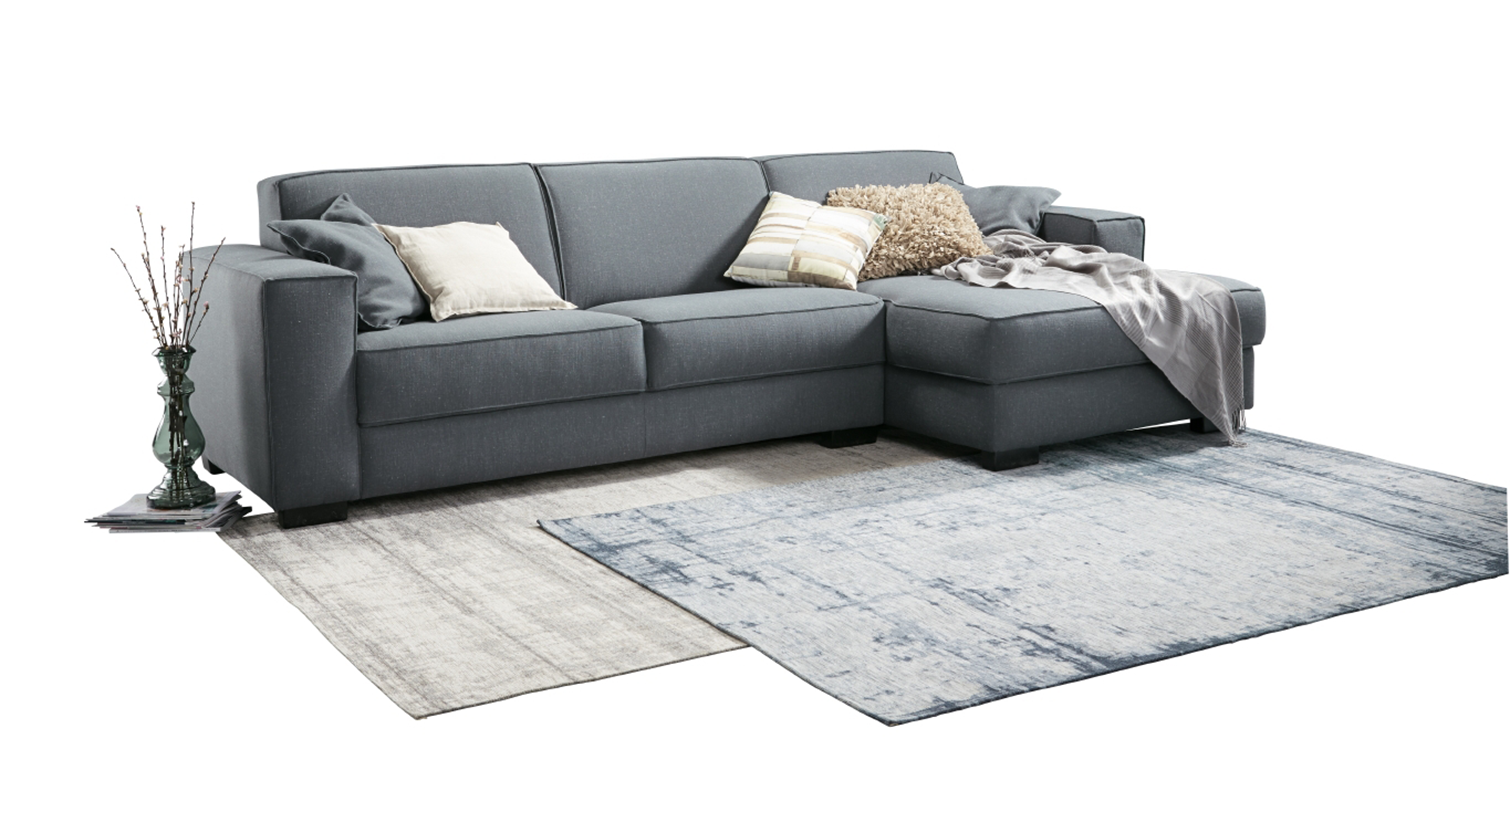 Stoffen meubels